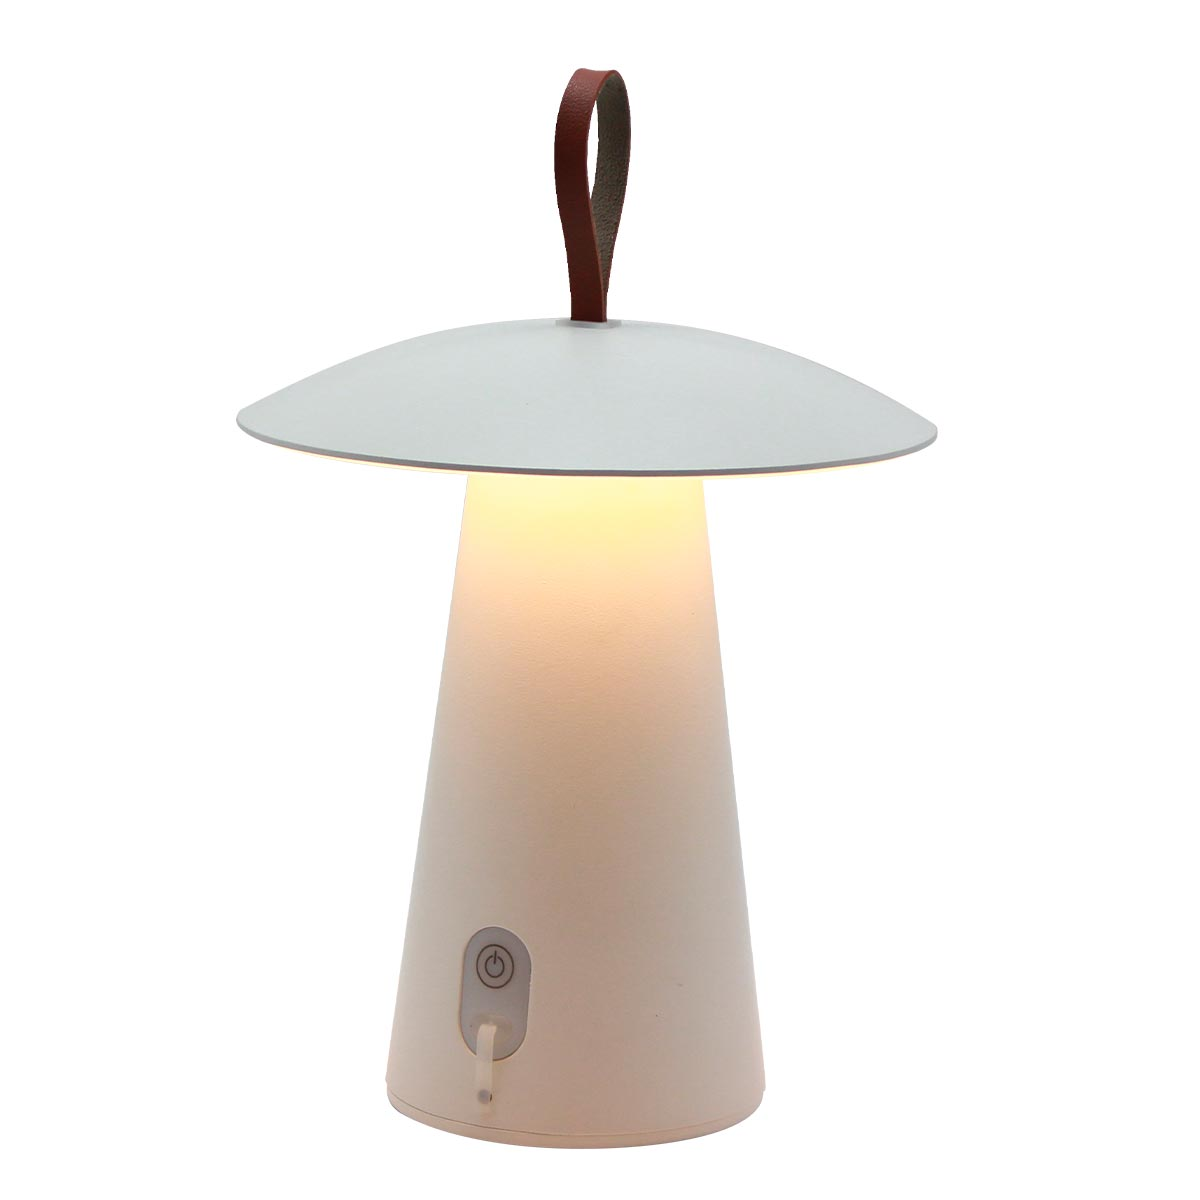 FUNGY - Lampe de table sans fil aluminium blanc 29cm